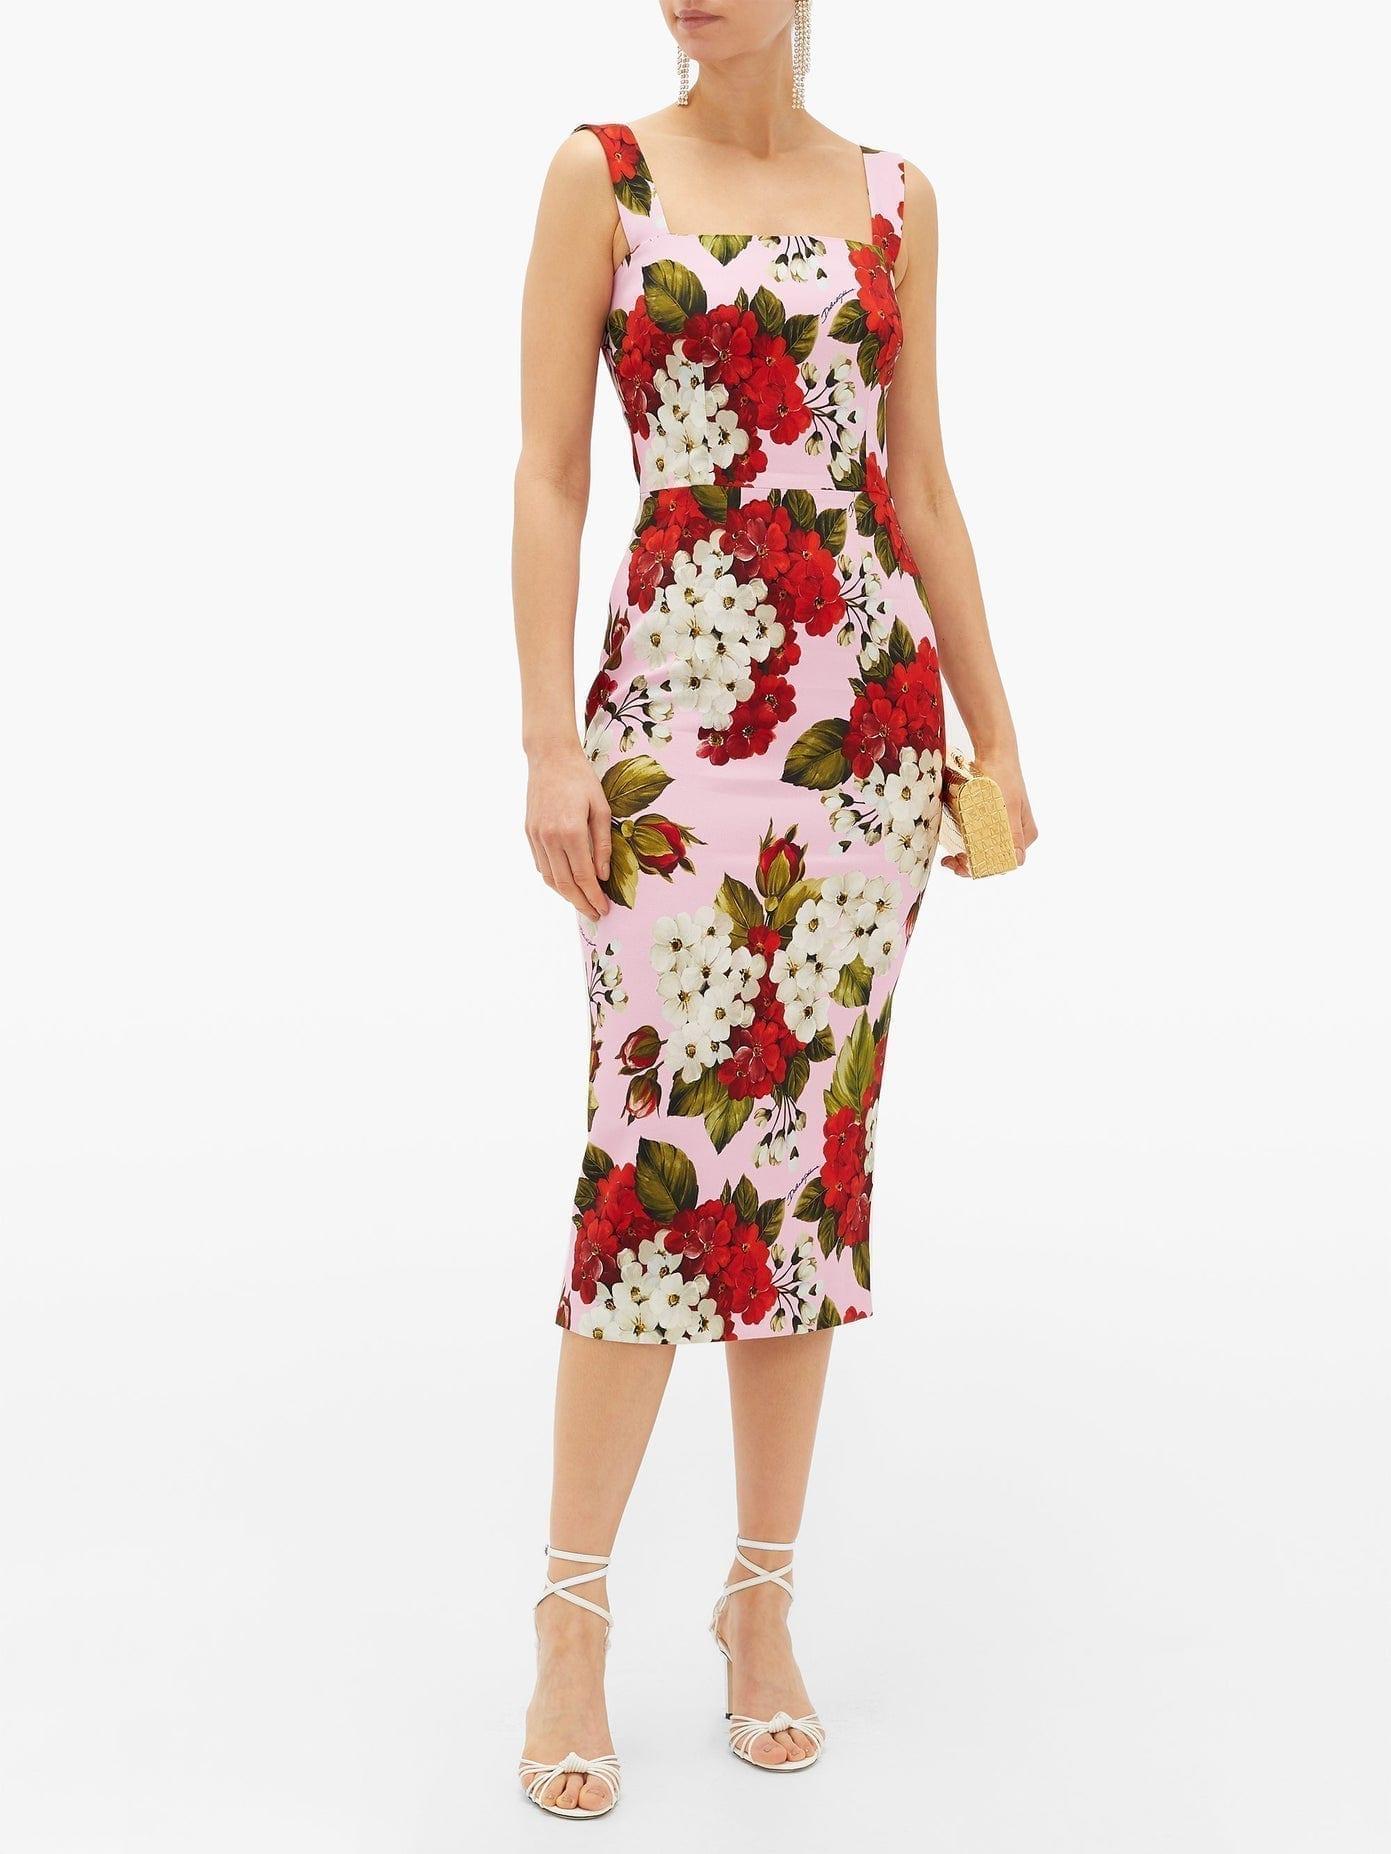 DOLCE & GABBANA Floral-Print Cady Midi Dress